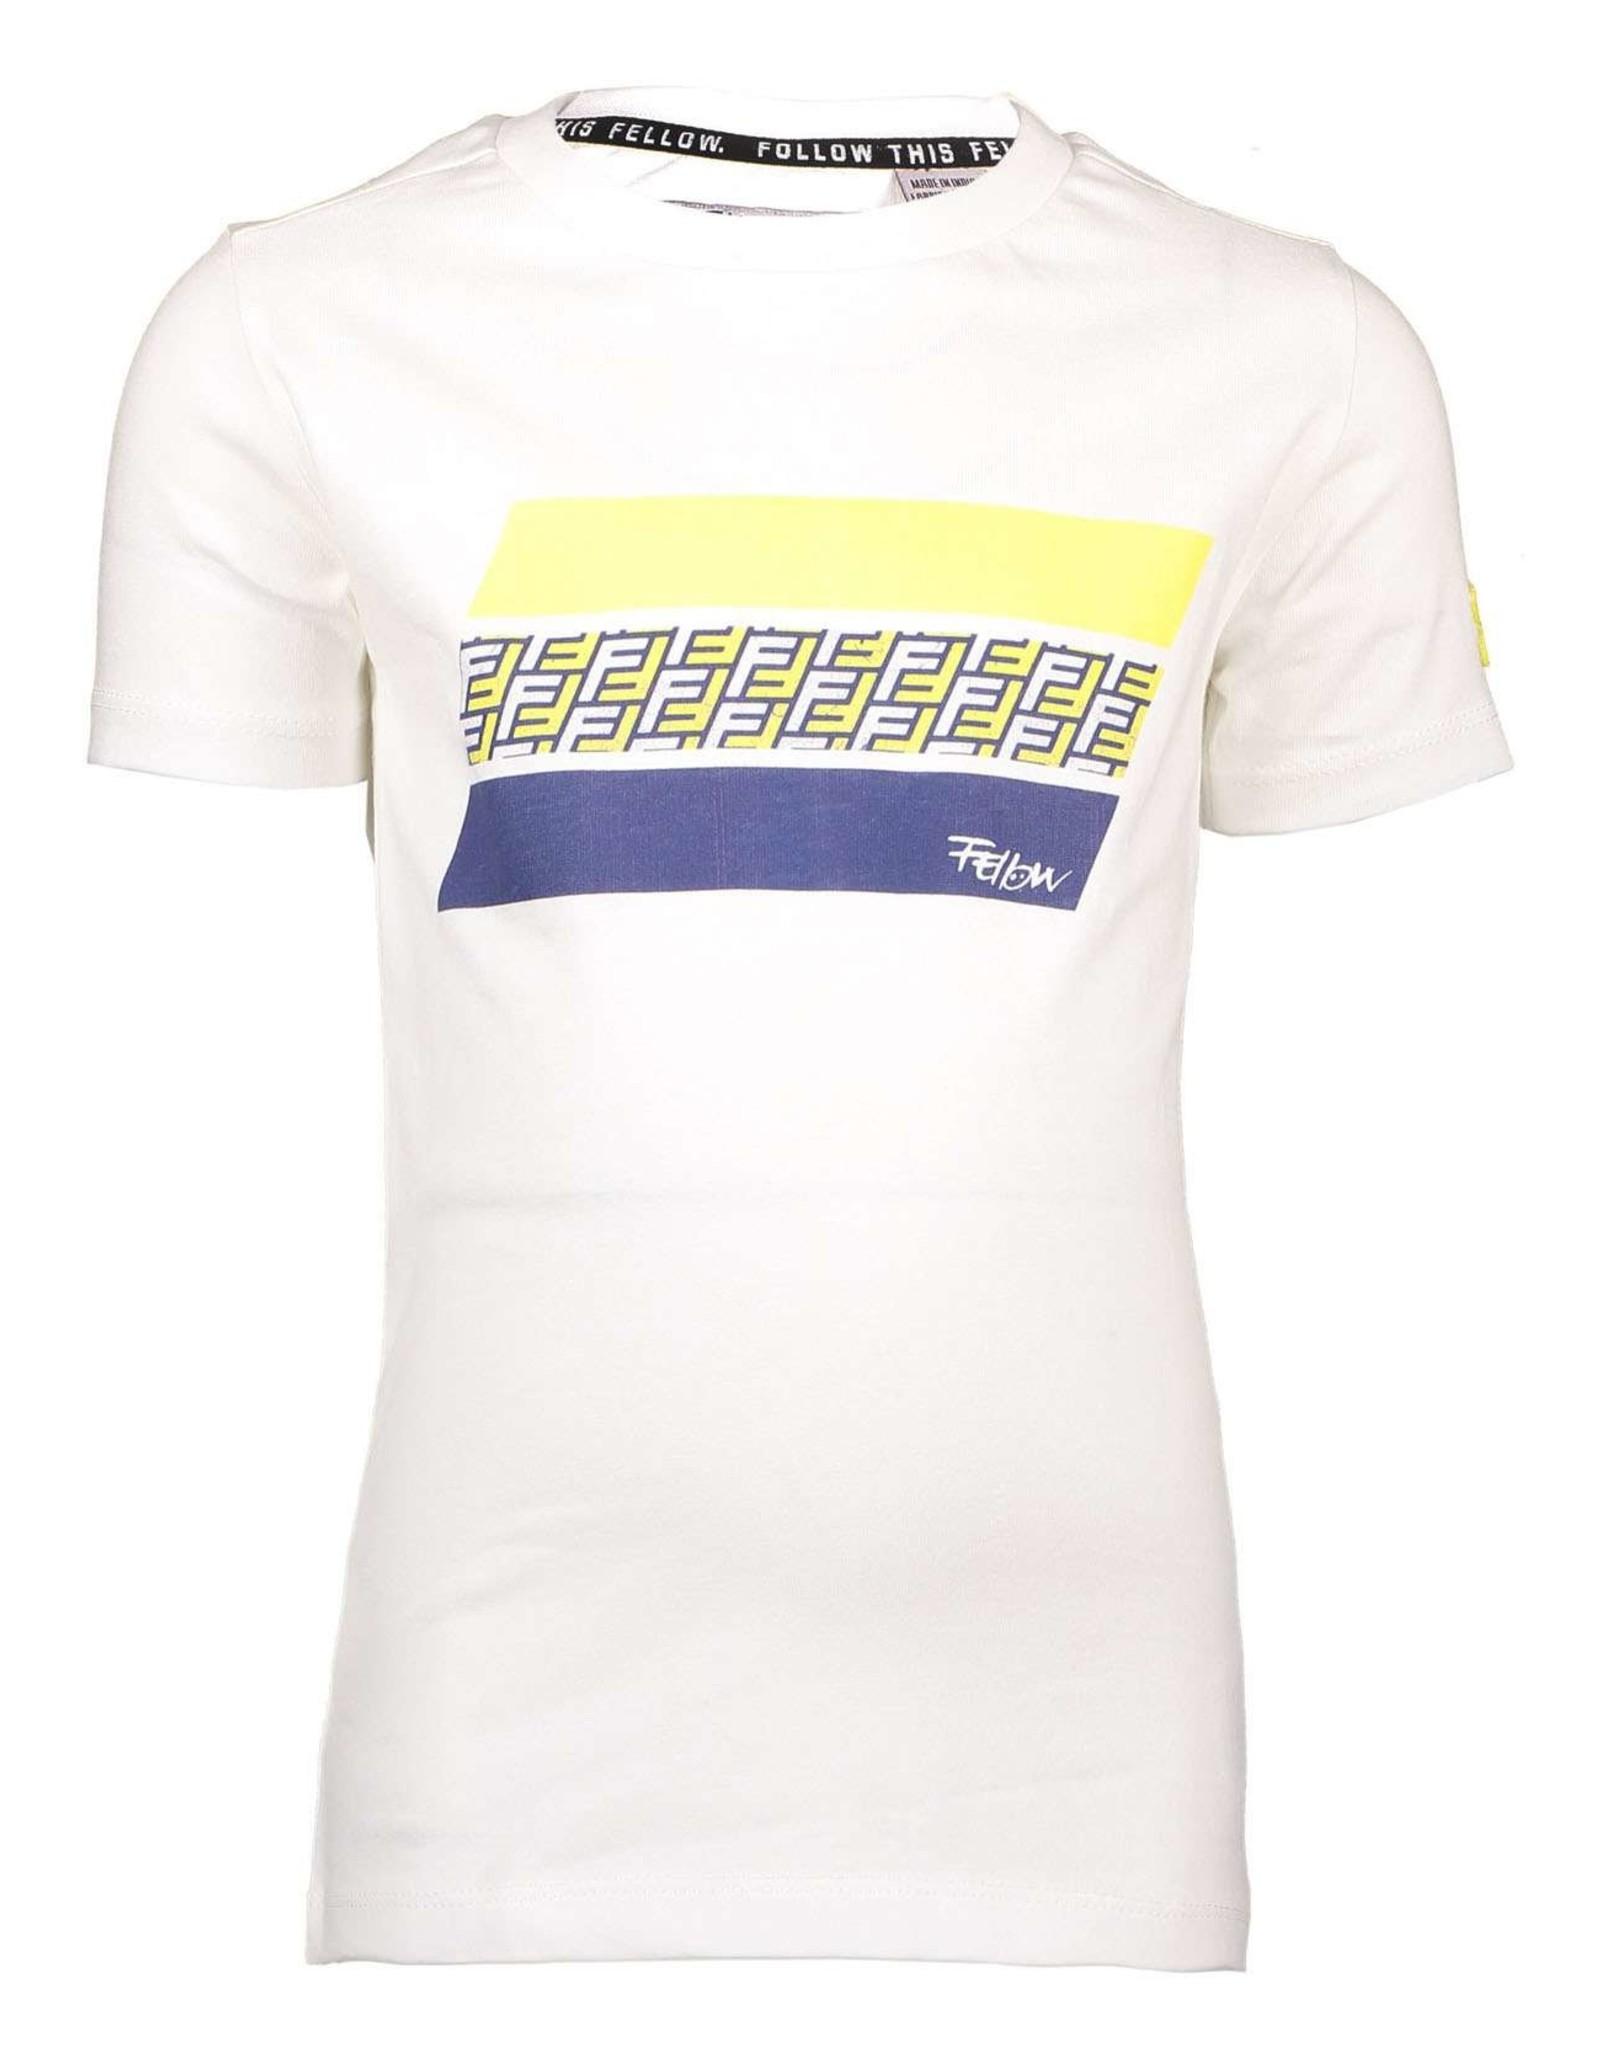 Moodstreet Fellow Moodstreet Fellow T-shirt Follow this Fellow White